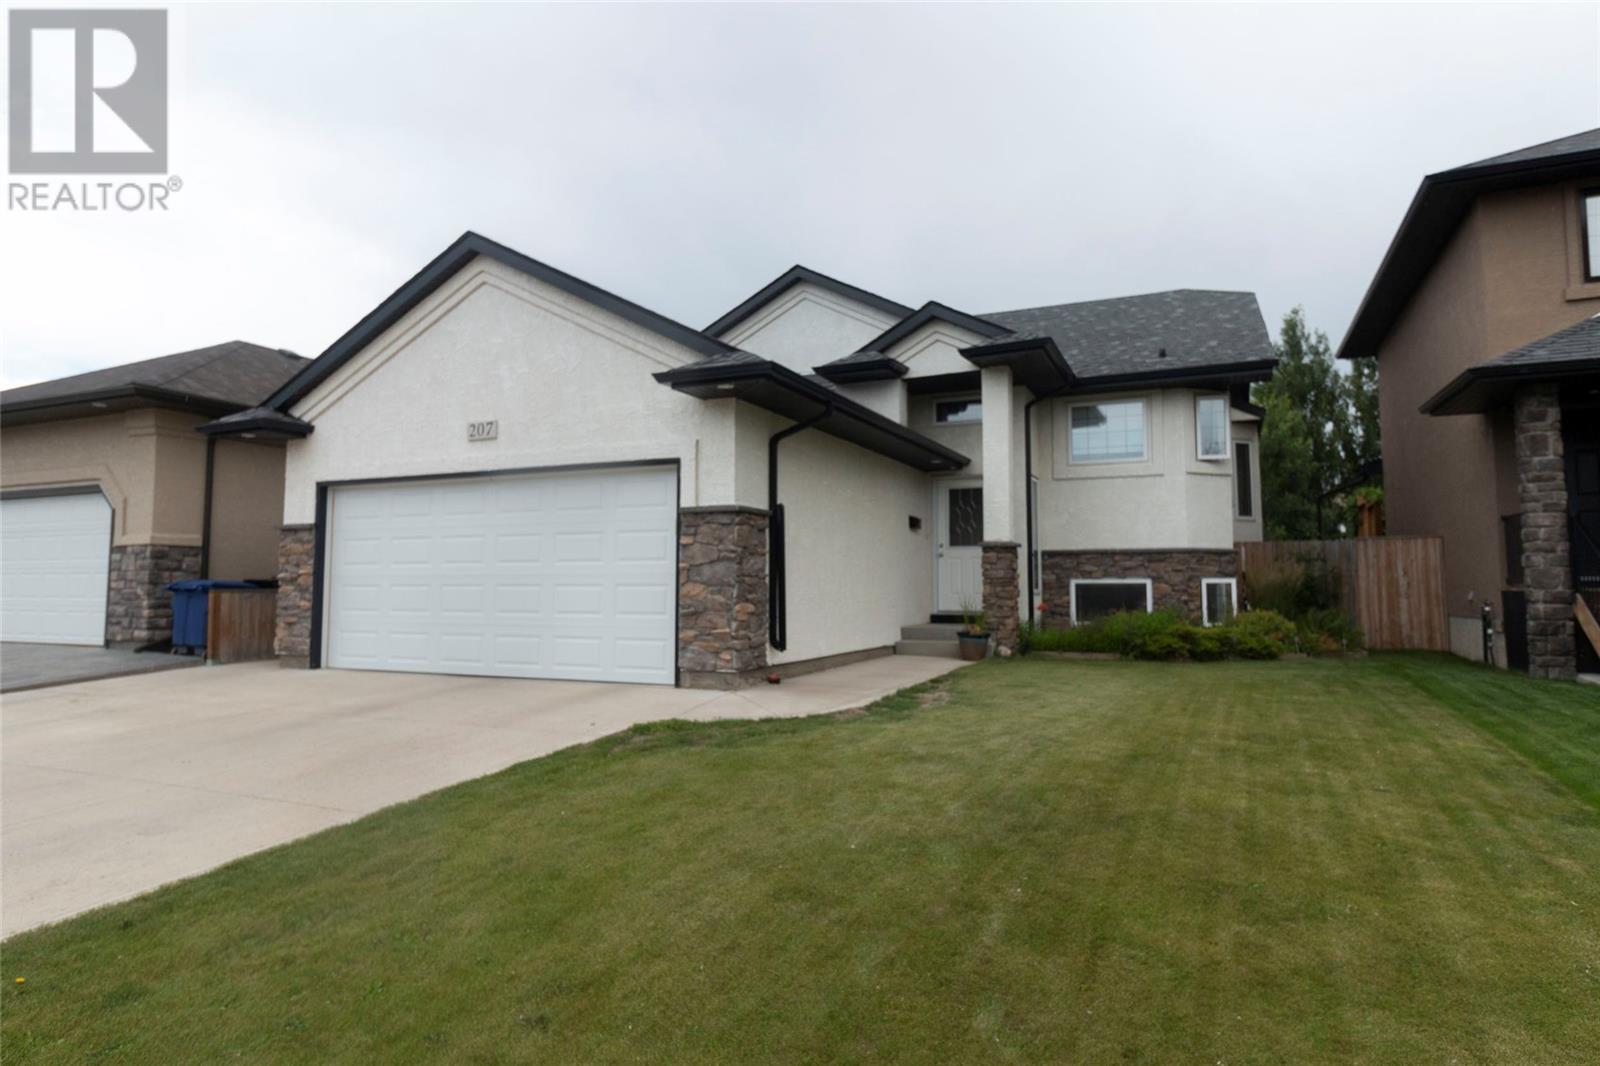 Removed: 207 Fawcett Crescent, Saskatoon, SK - Removed on 2019-12-18 06:45:19